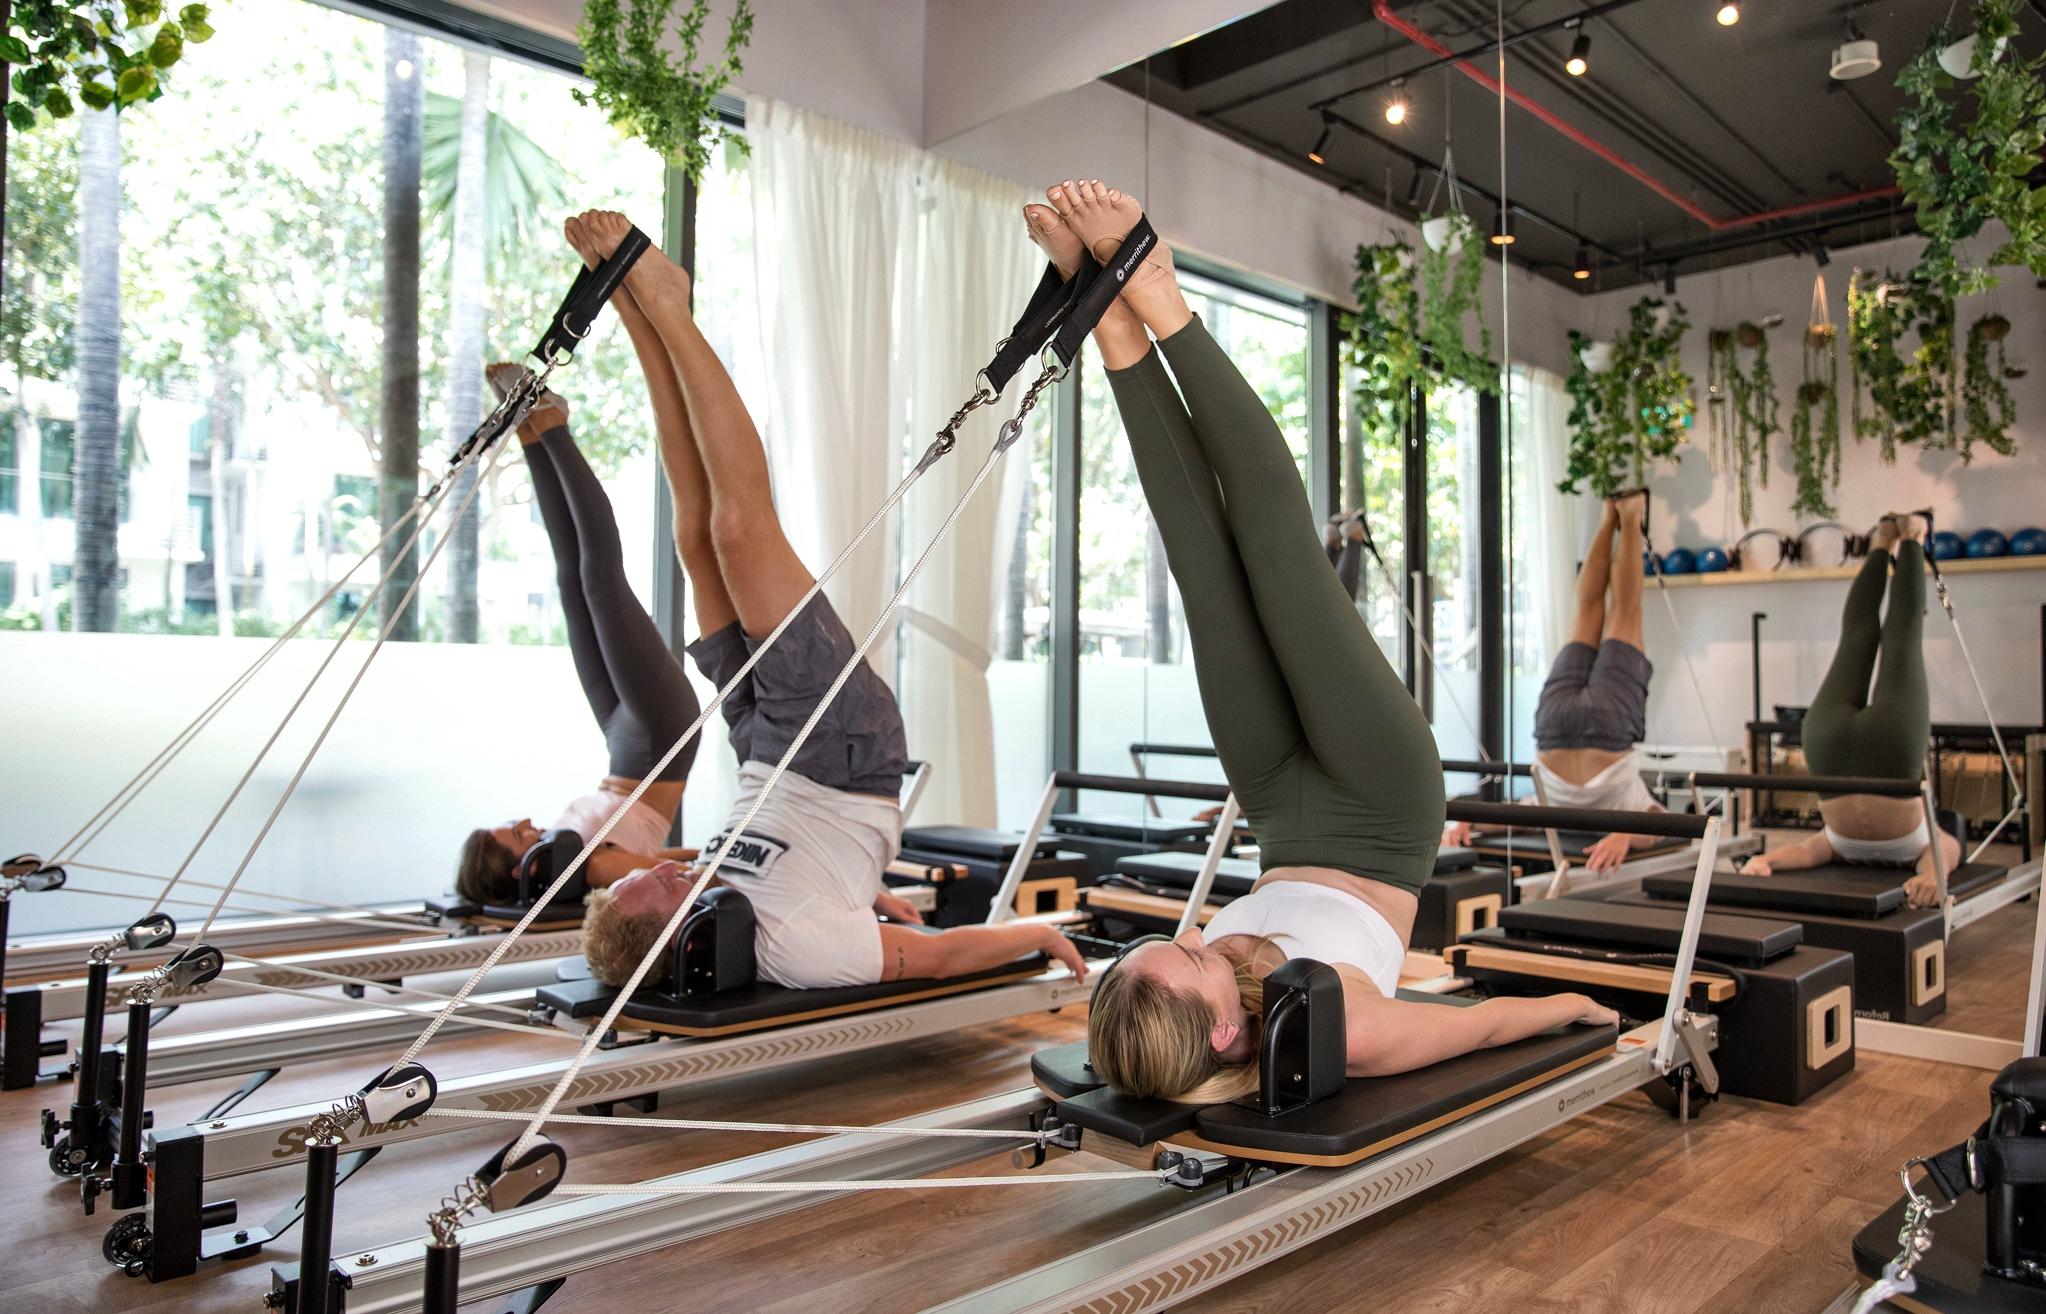 viva-pilates-athletic-conditioning-reformer-pilates.jpg